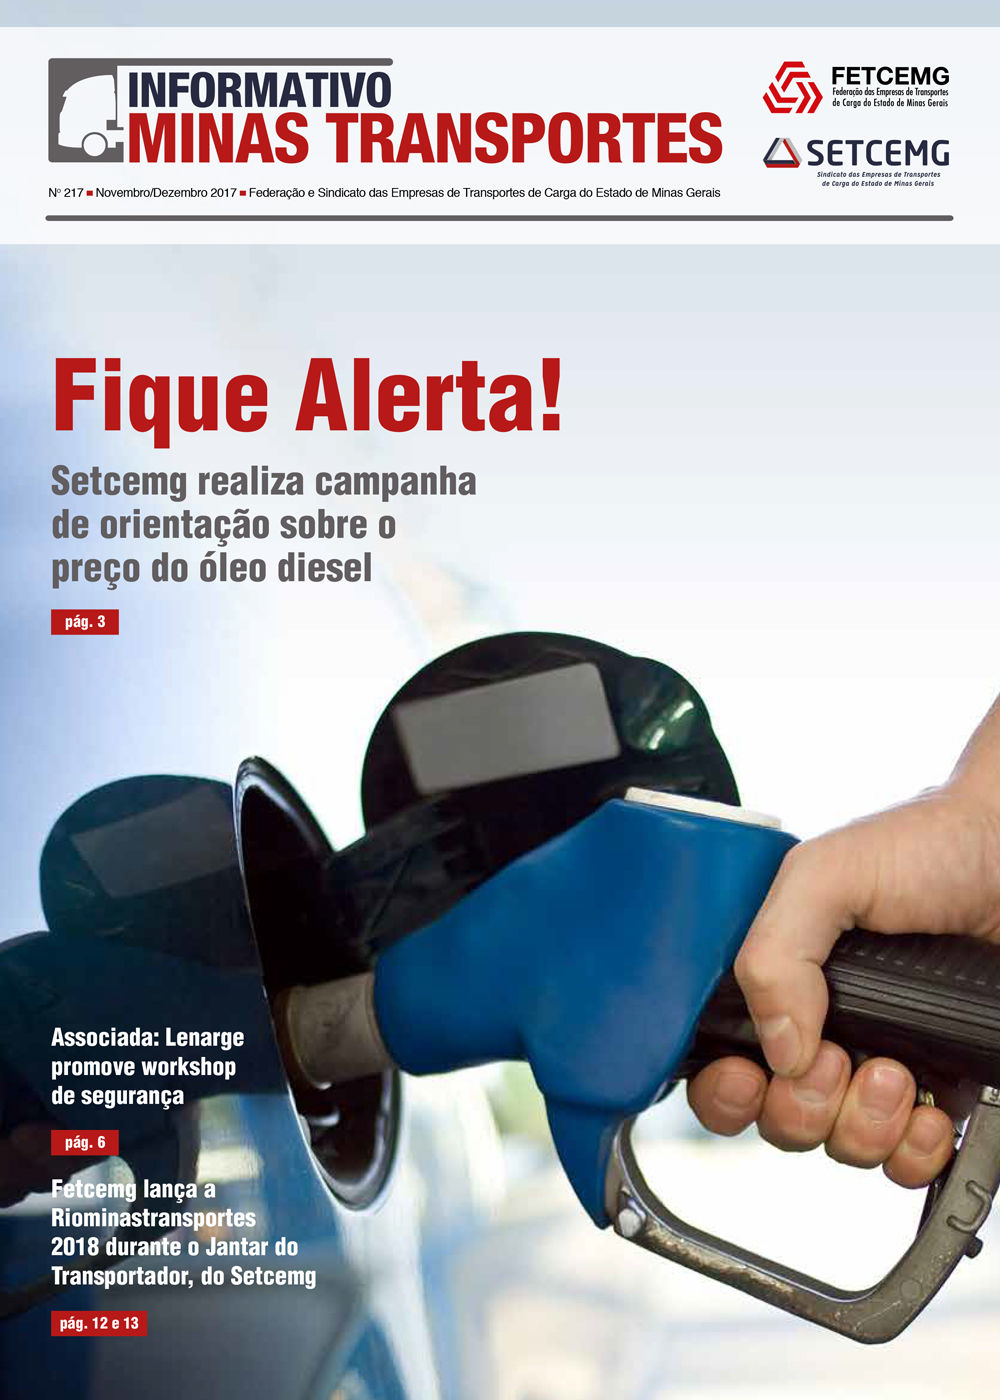 Informativo Minas Transportes - nº 217